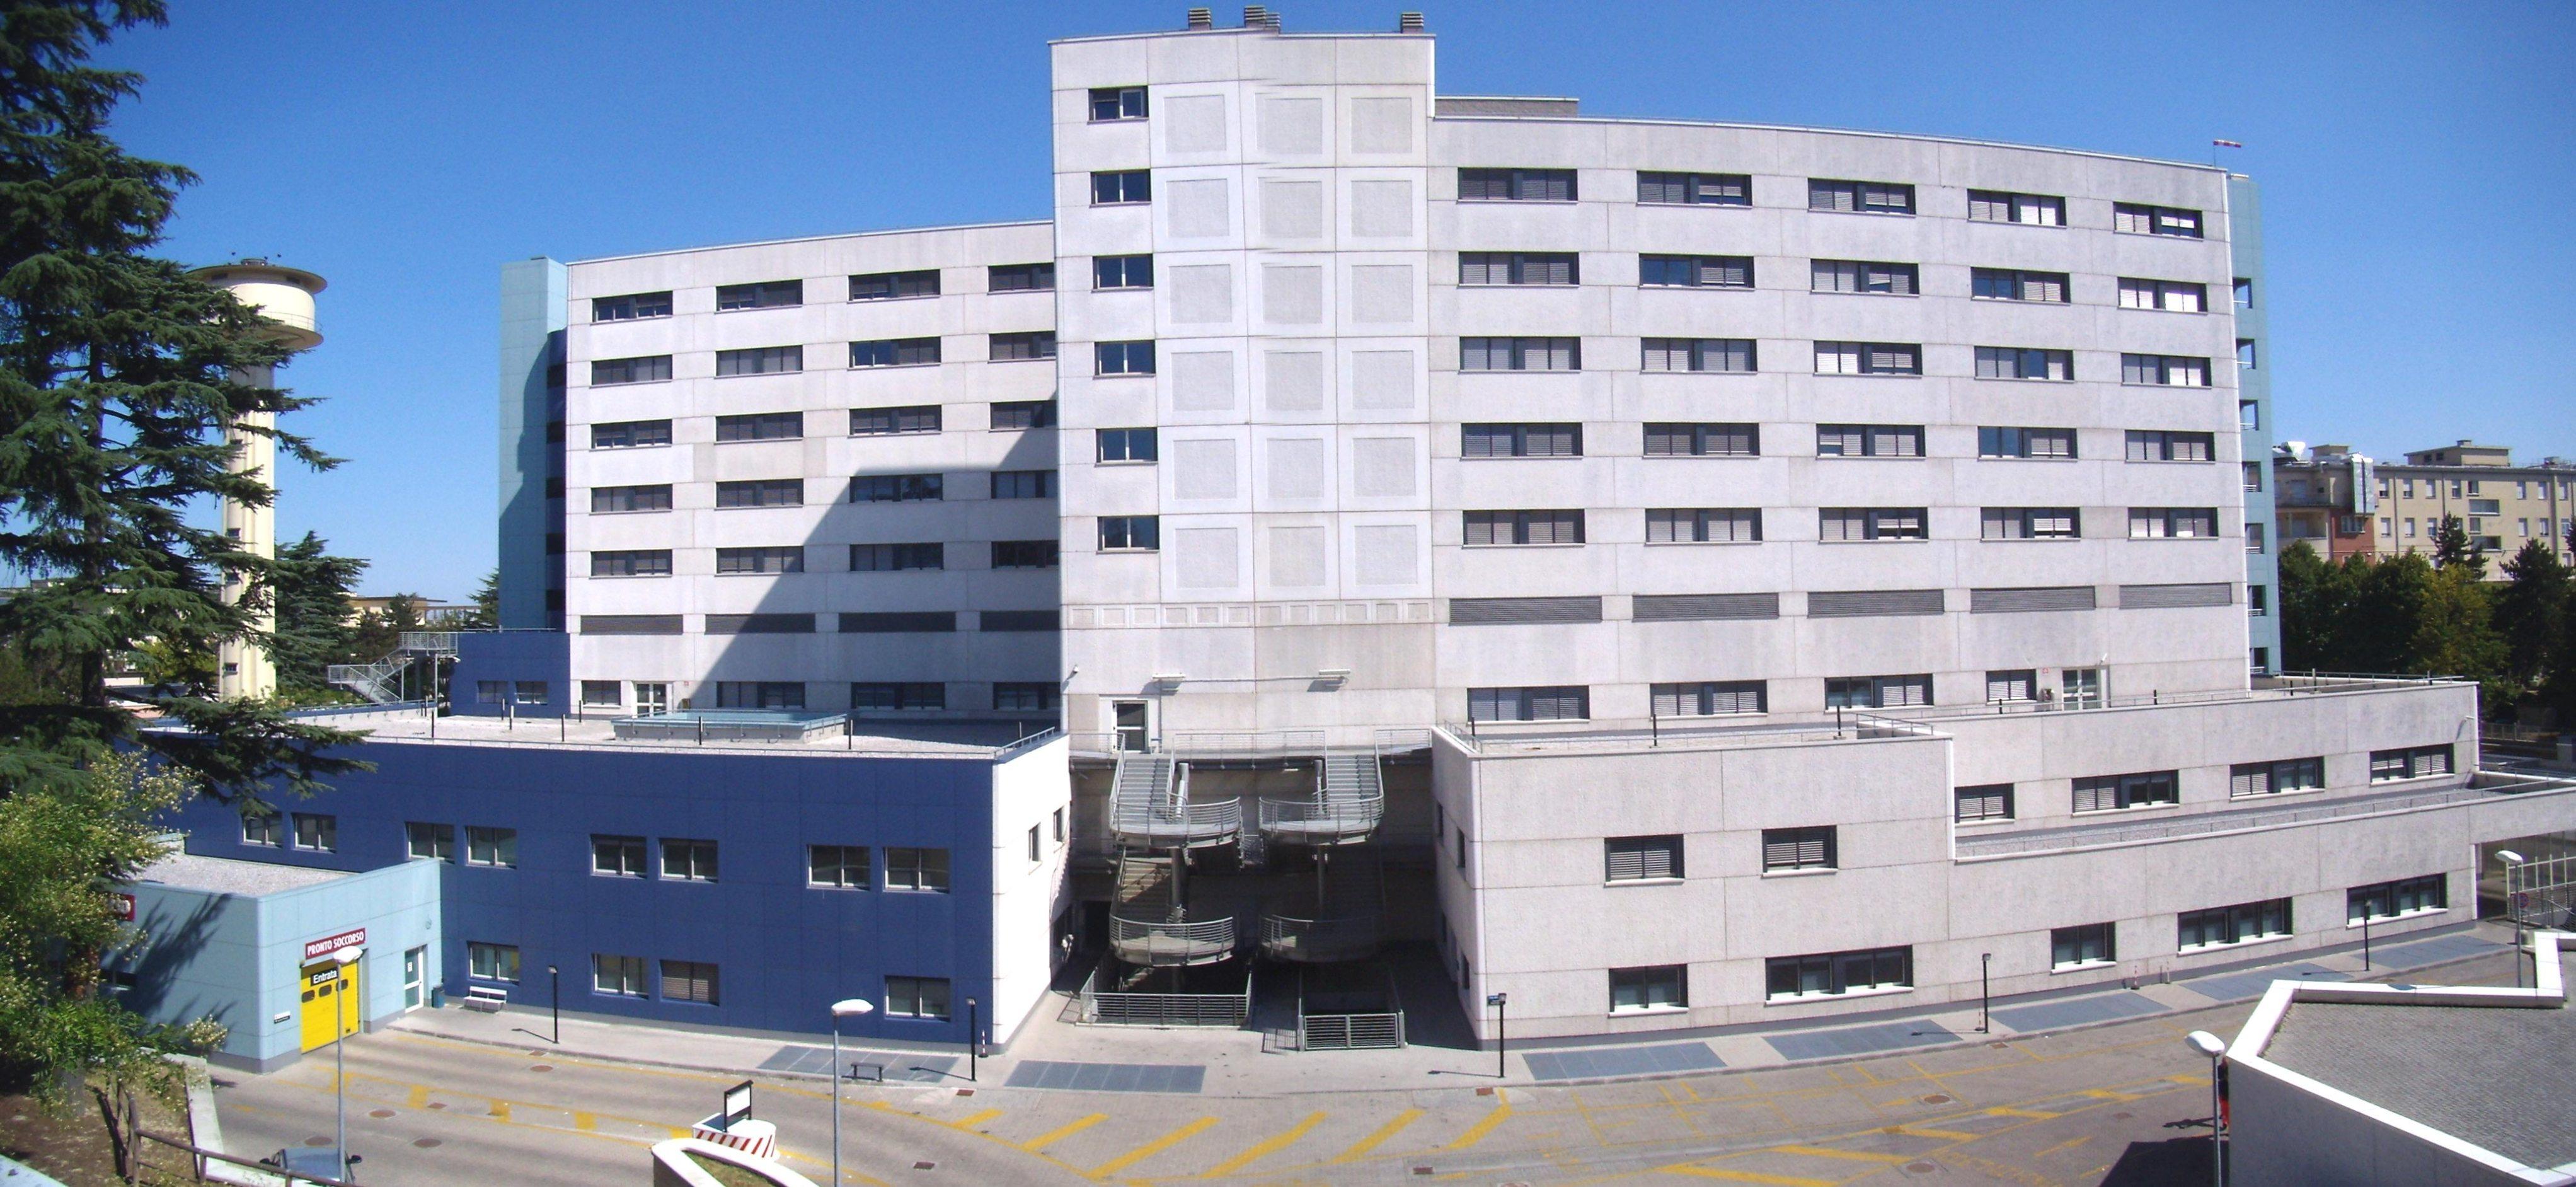 Ospedale-Morgagni-Pierantoni-Forlì